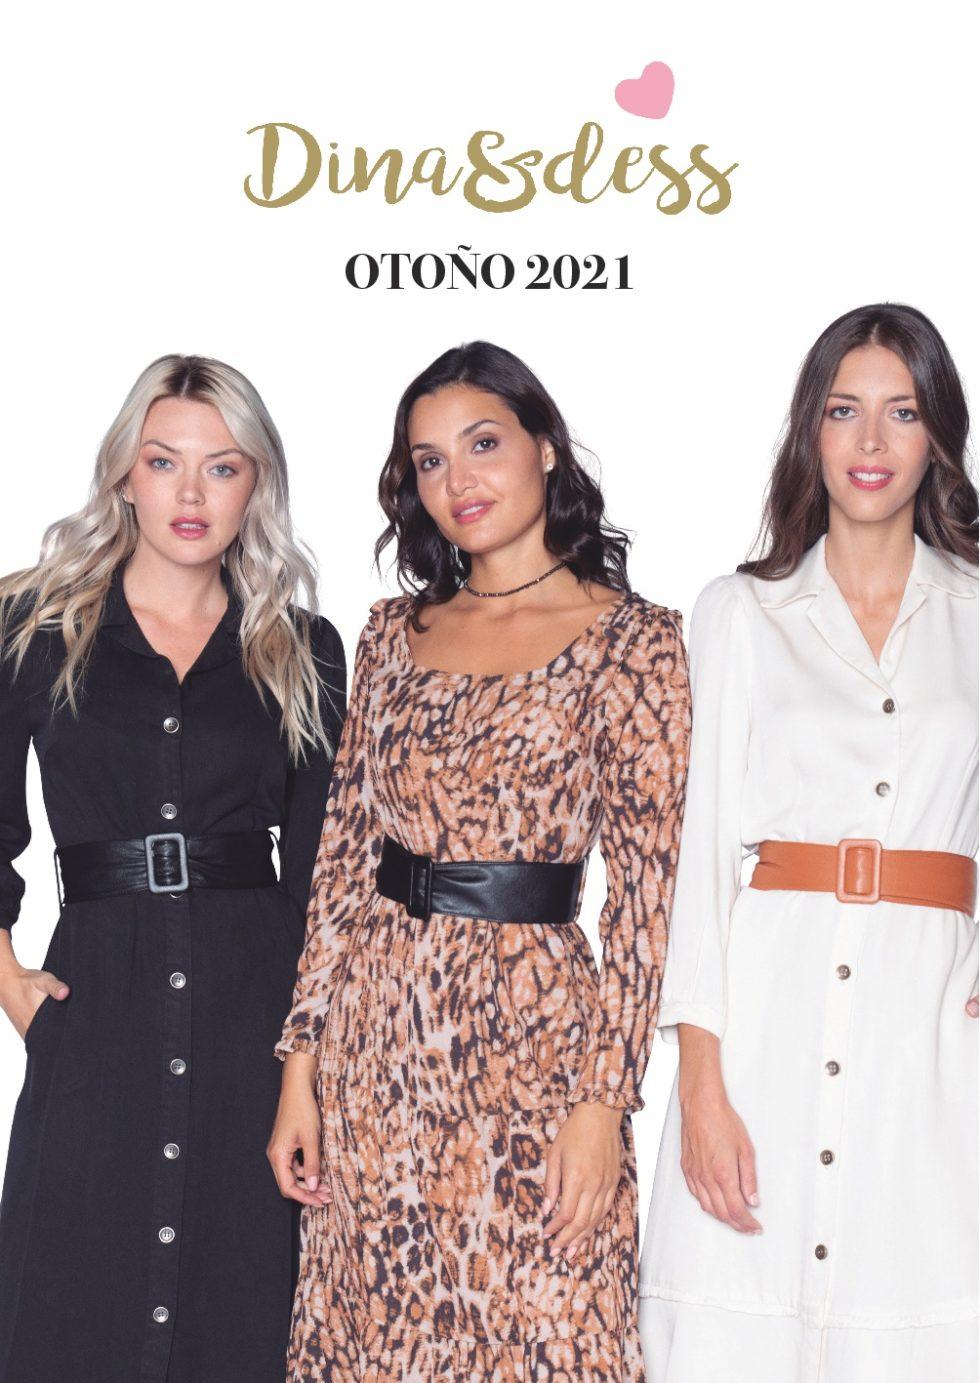 Otoño 2021 Dina&Dess-001